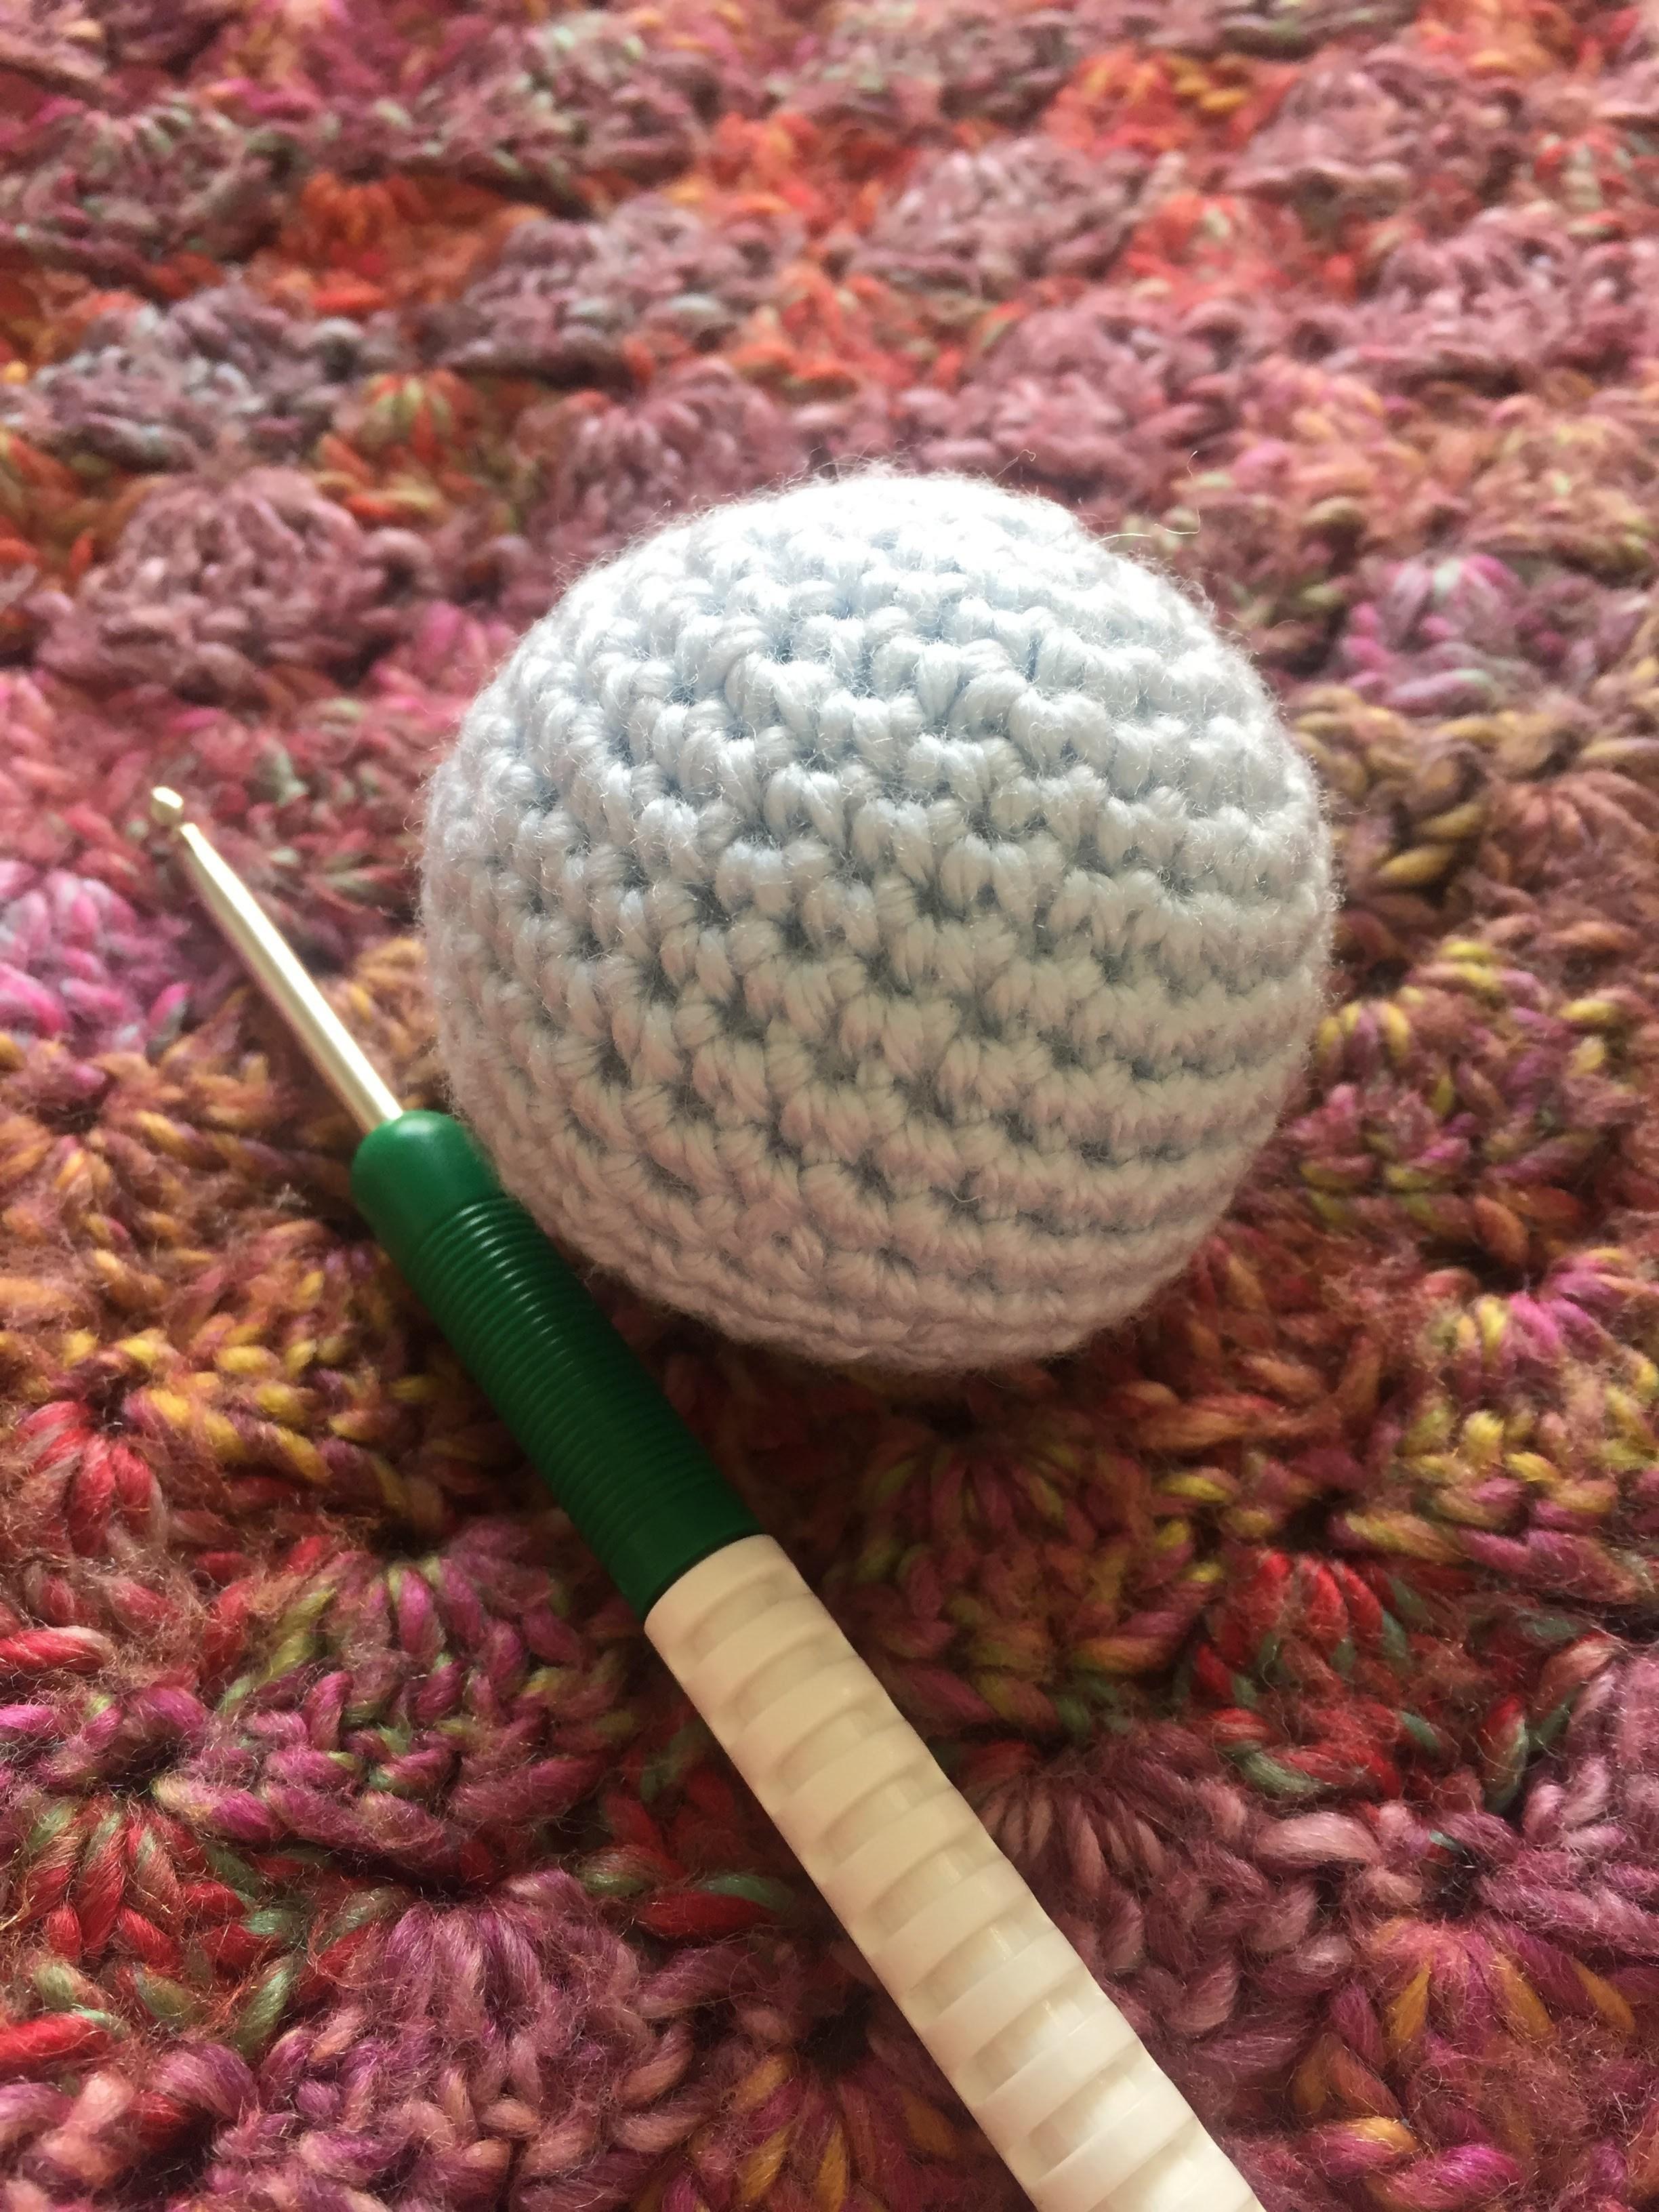 Crochet Sphere How To Make Crochet Sphere Pam Op